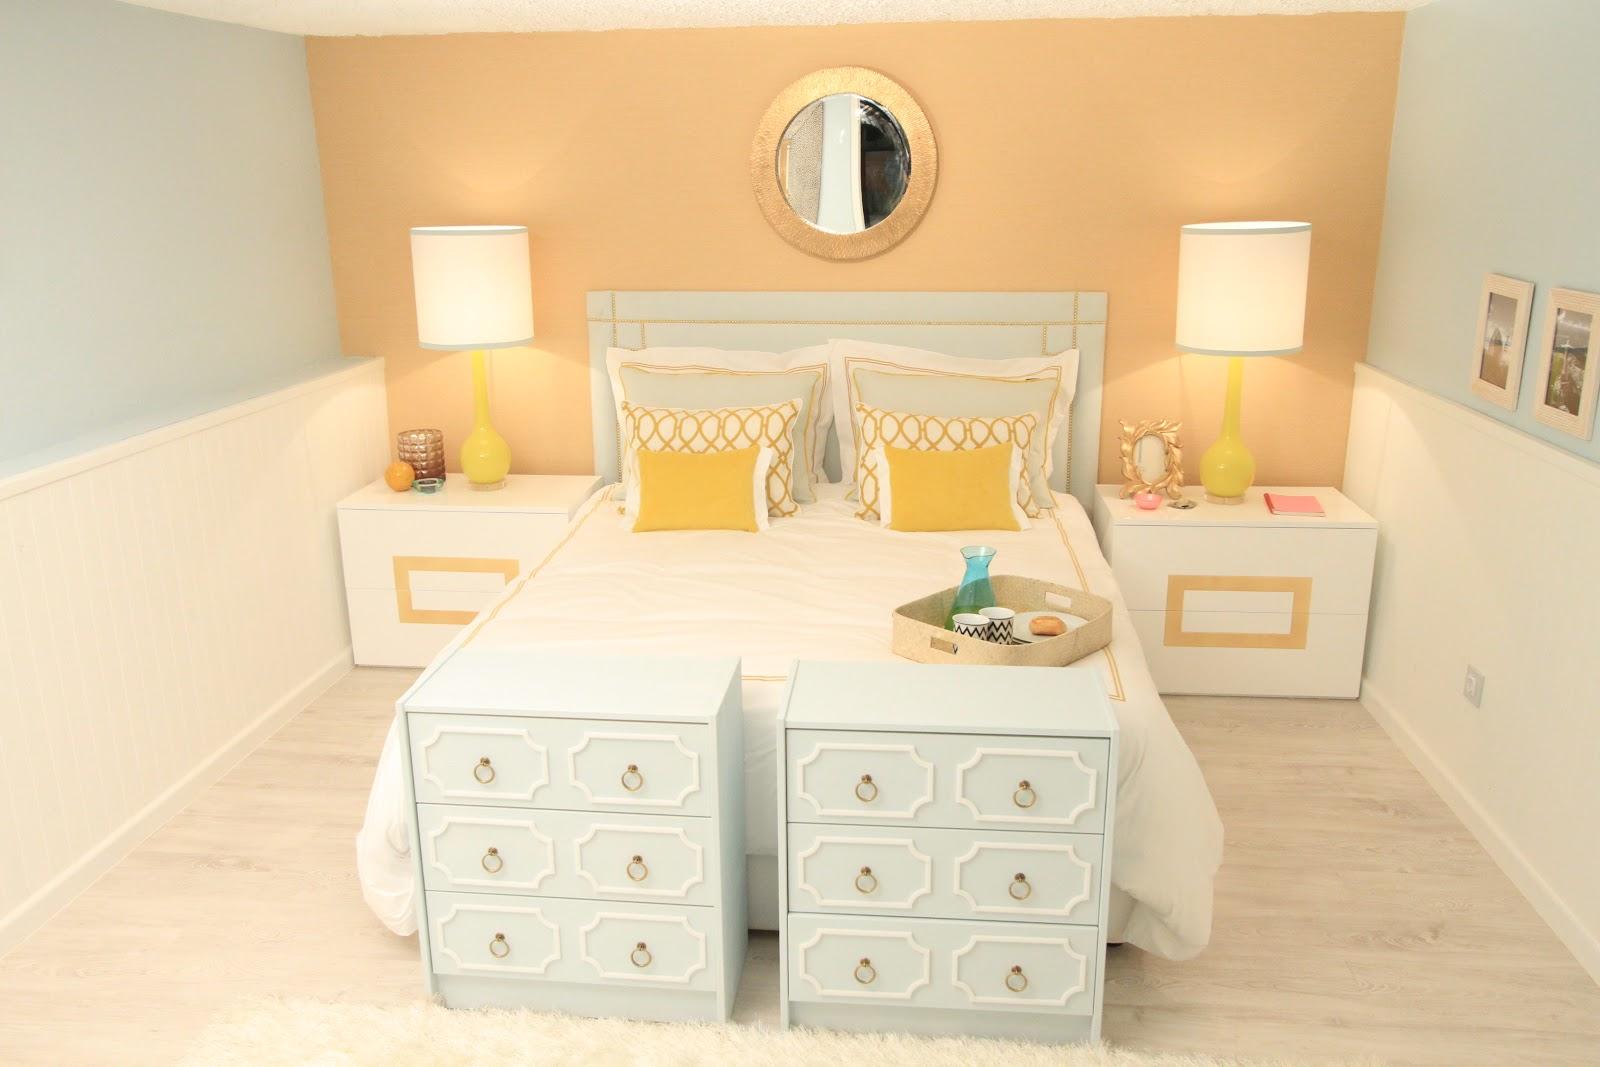 Home Styling Ana Antunes Querido Mudei A Casa Tv Show